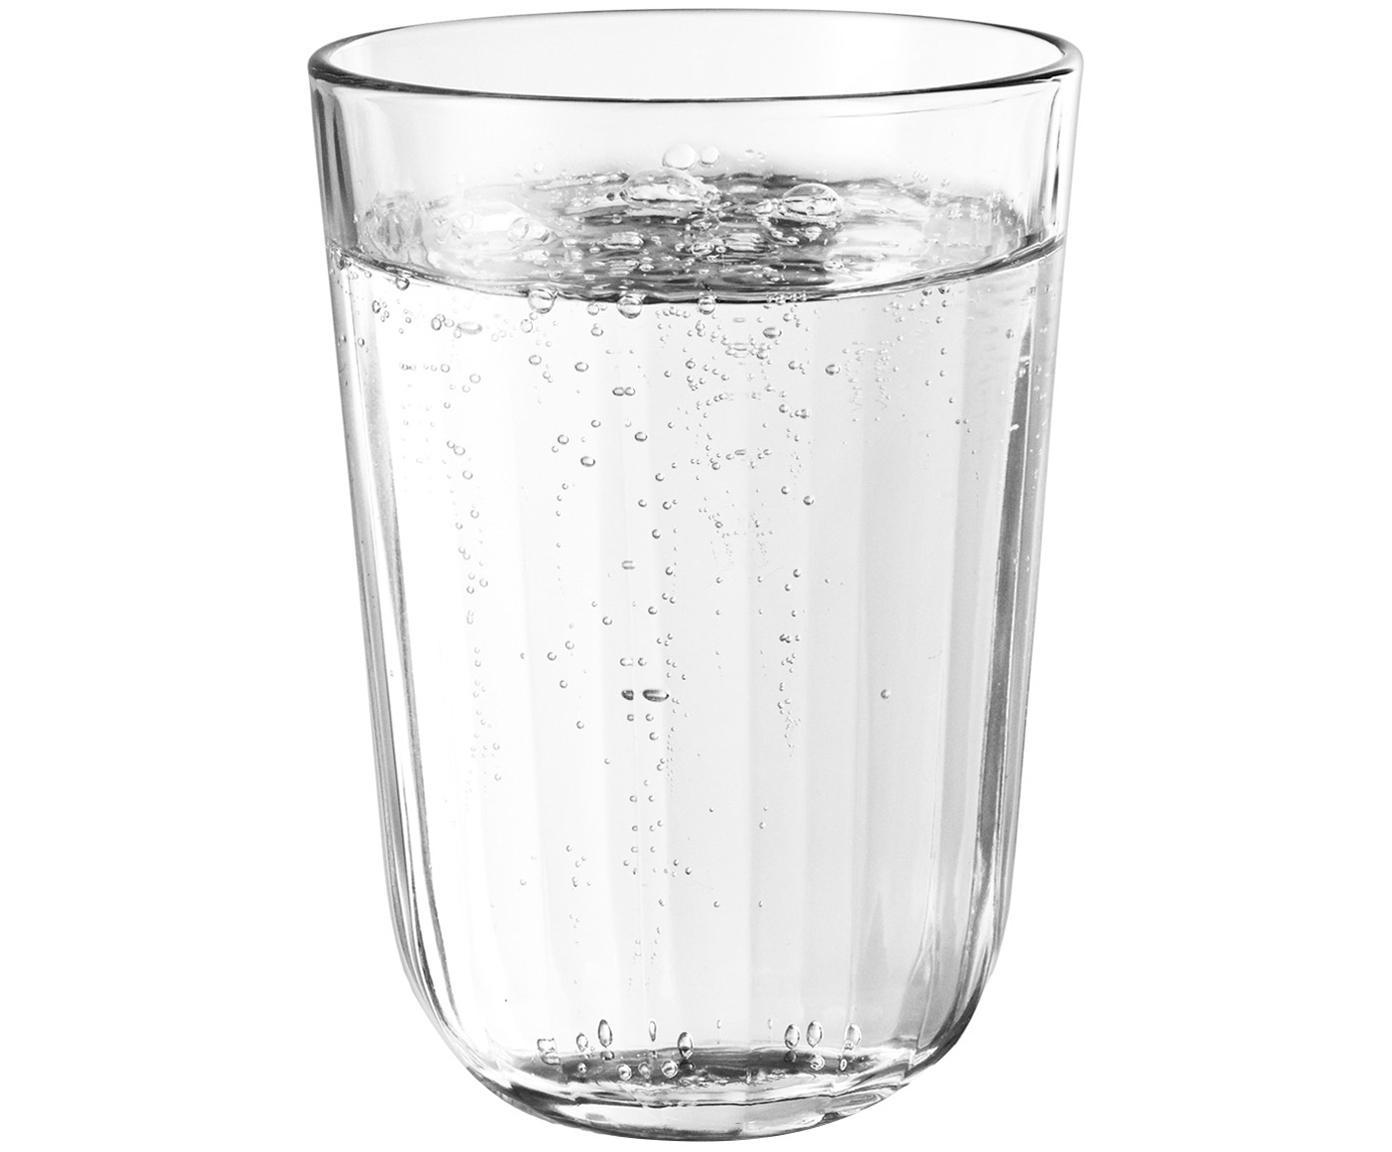 Vasos termo de vidrio templado Facette, 4uds., Vidrio, Transparente, 340 ml